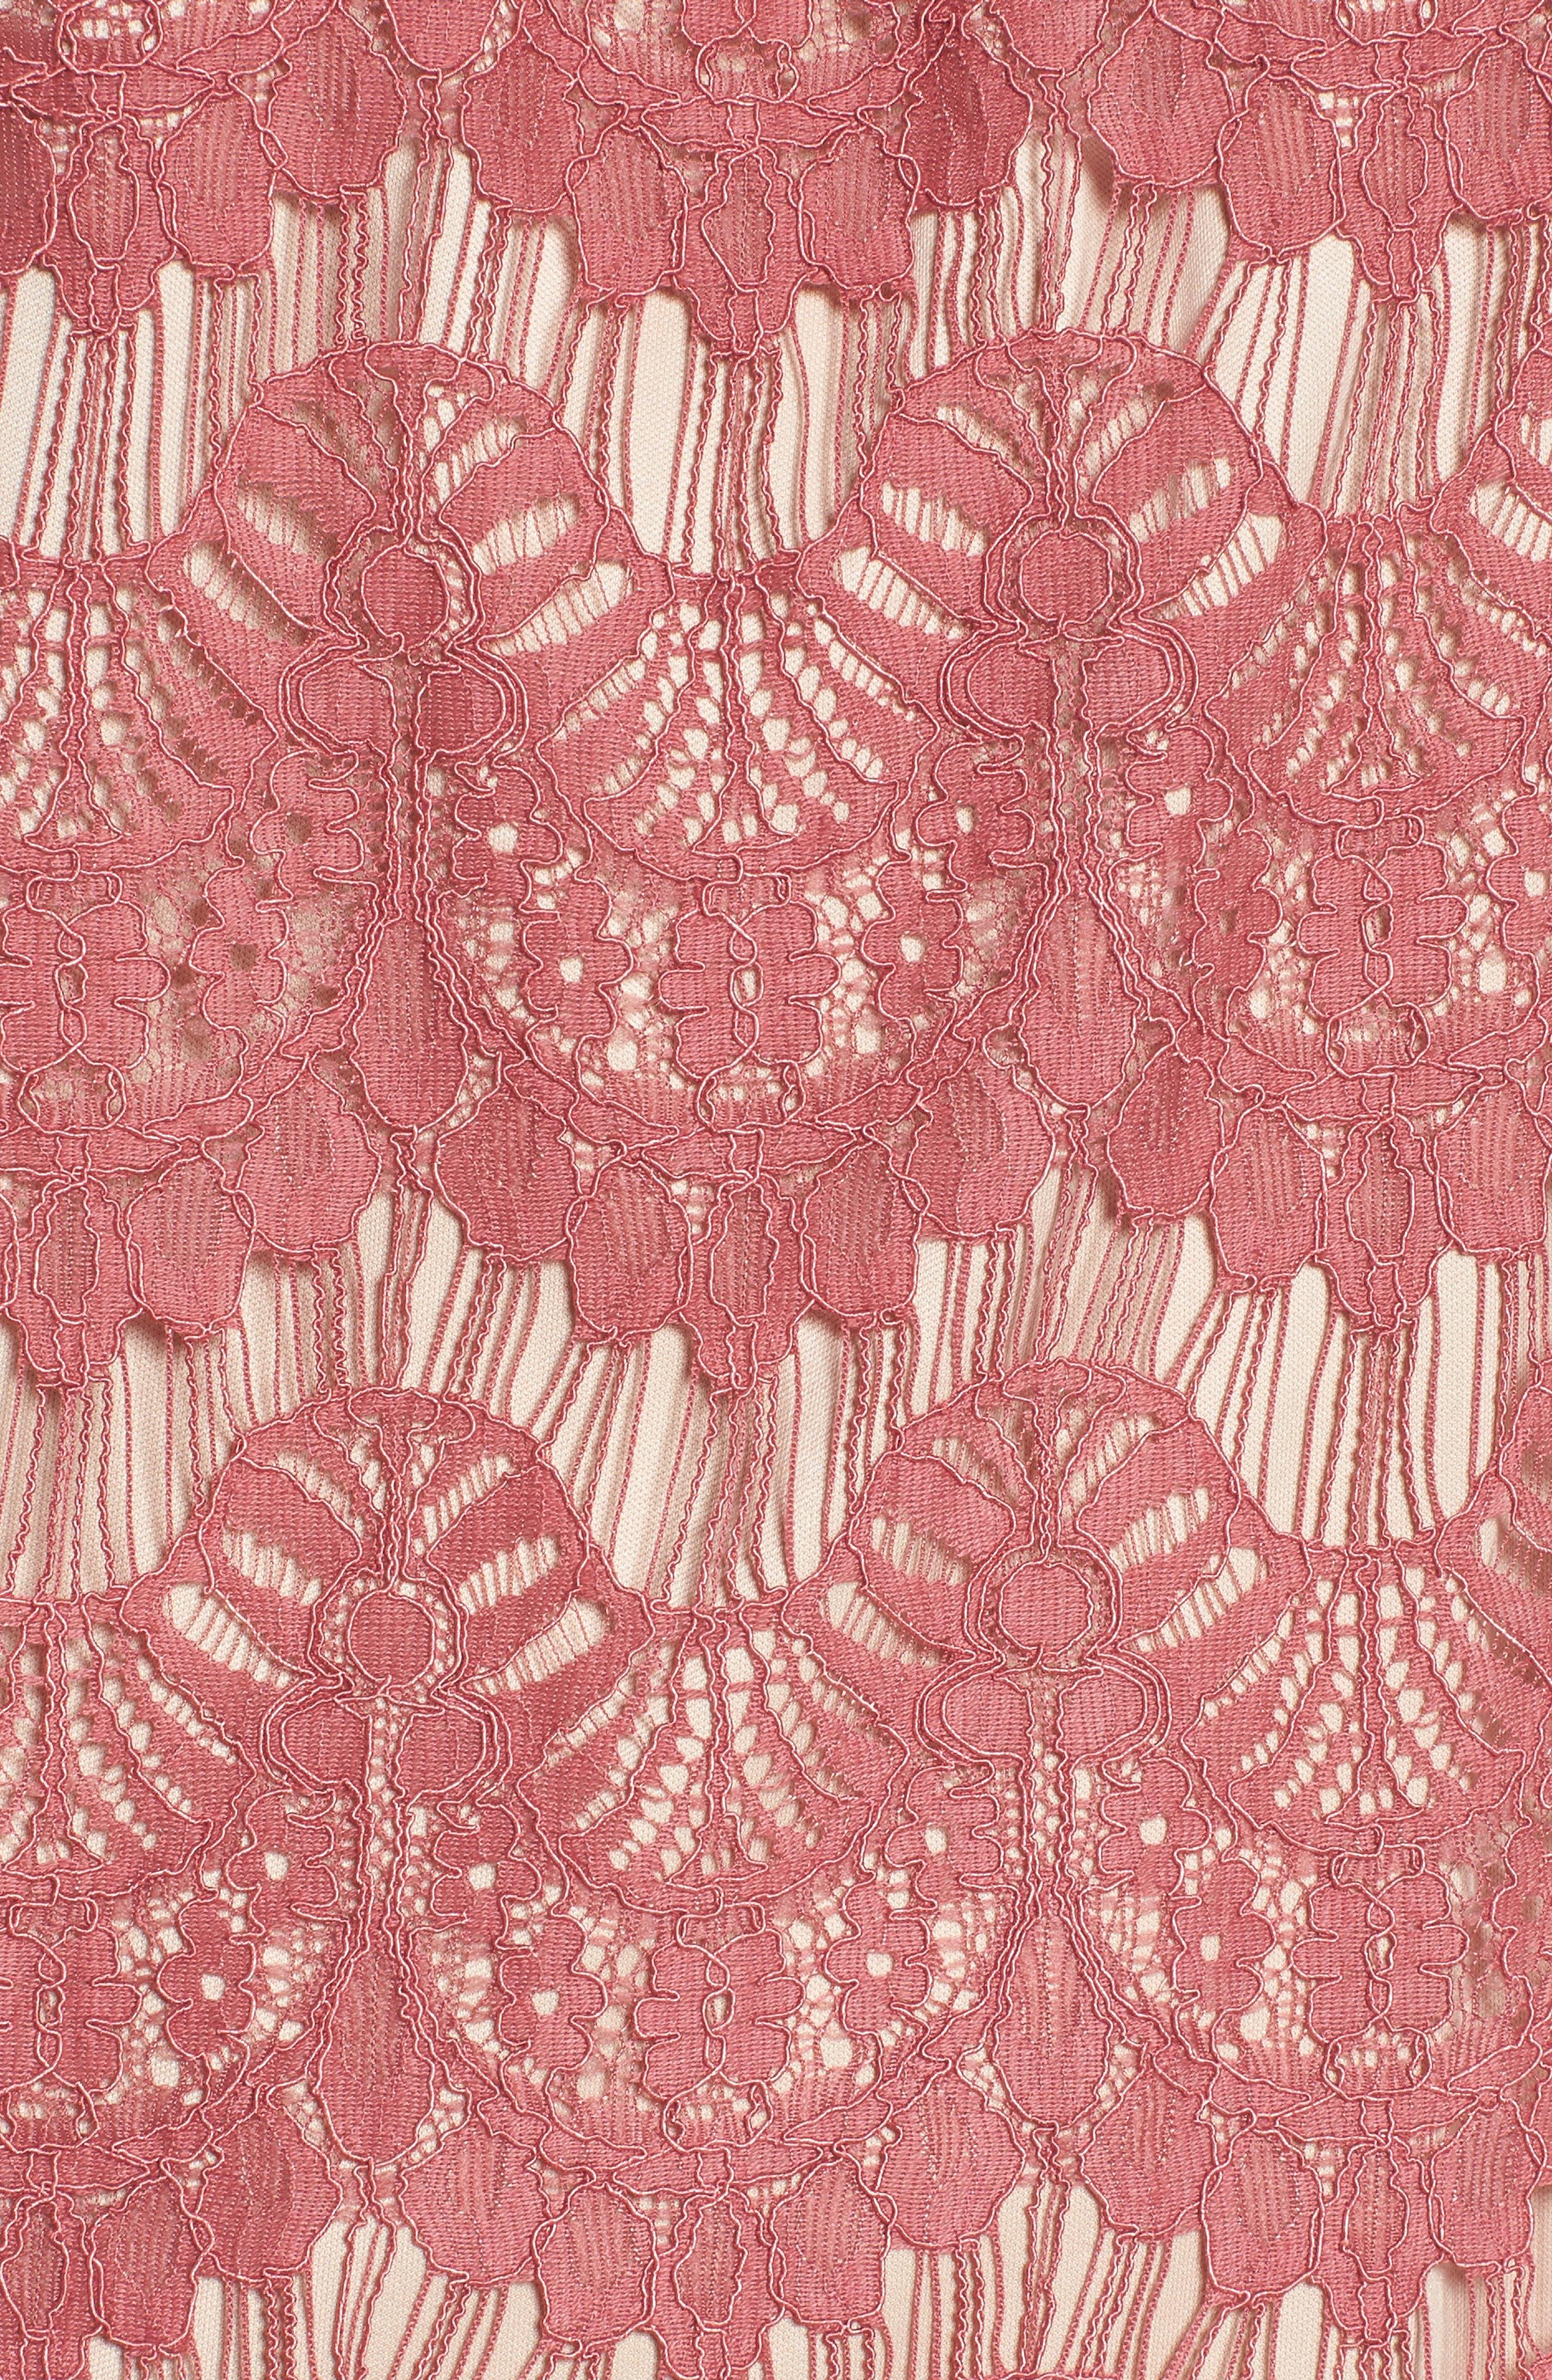 Lace Shift Dress,                             Alternate thumbnail 5, color,                             650